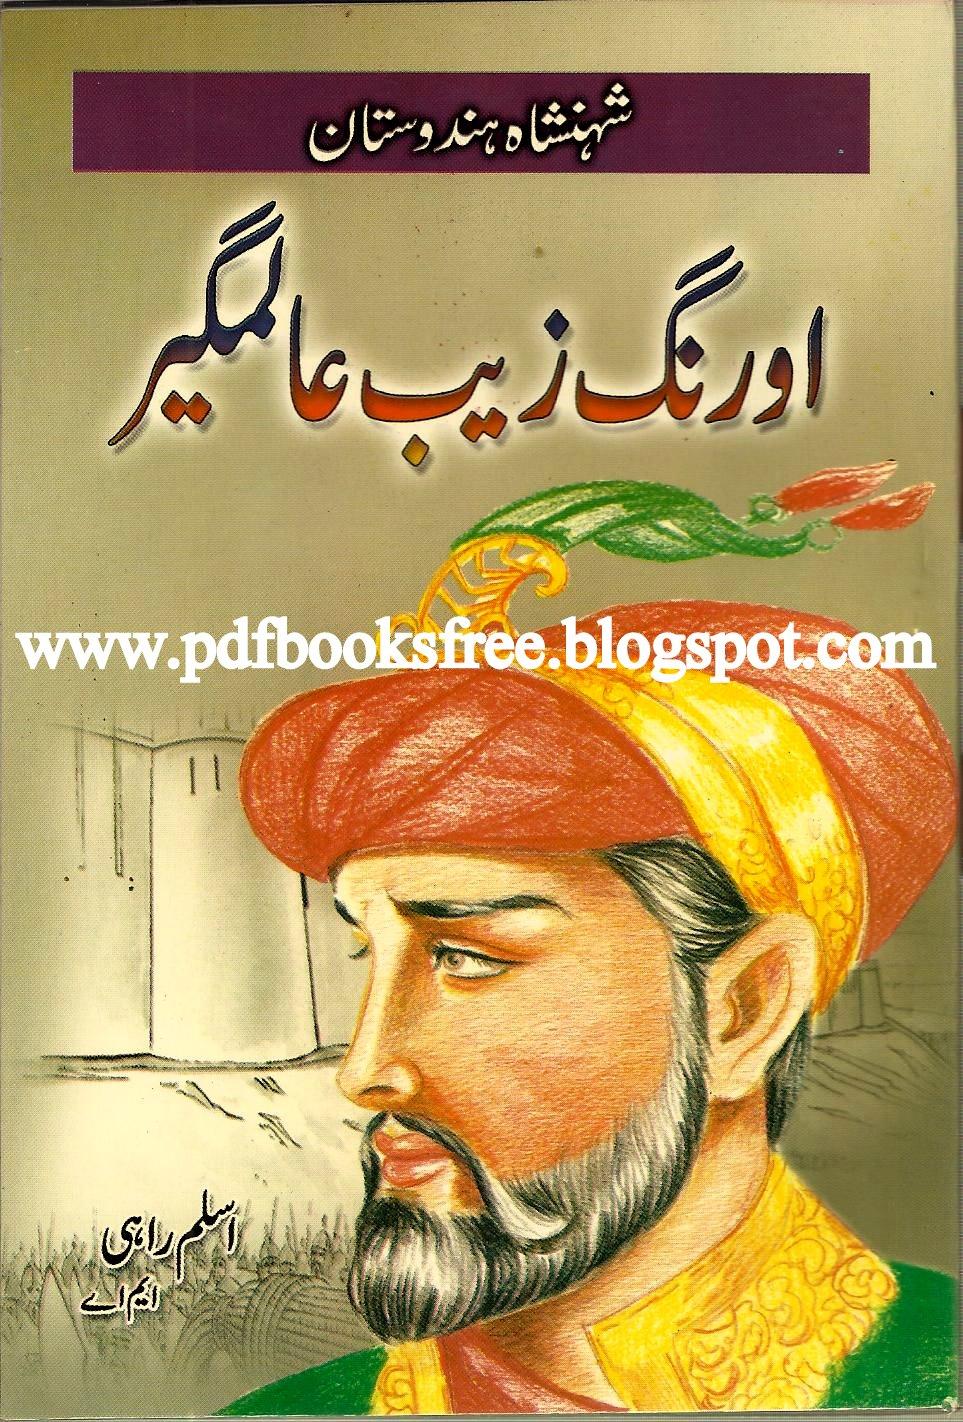 Forex trading books in urdu free download